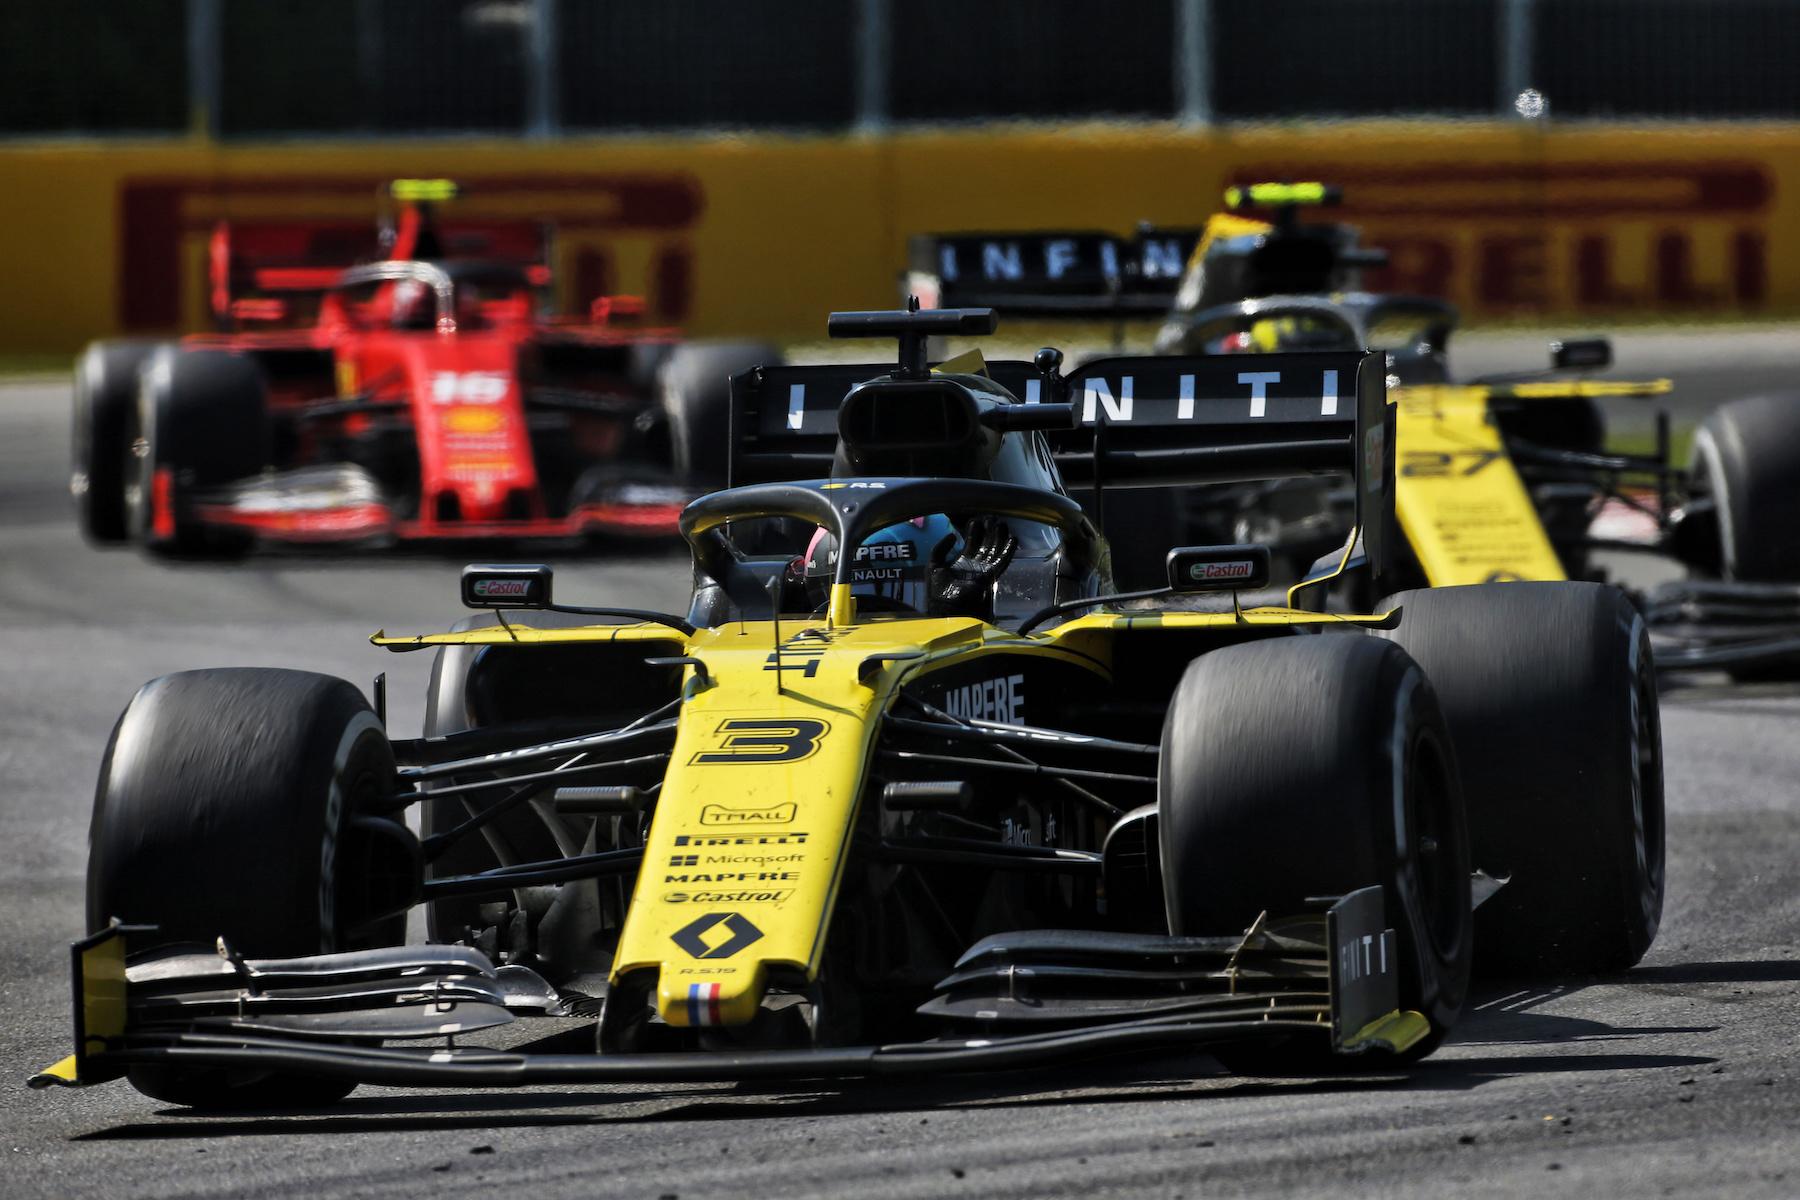 4 2019 Canadian GP 36.jpg